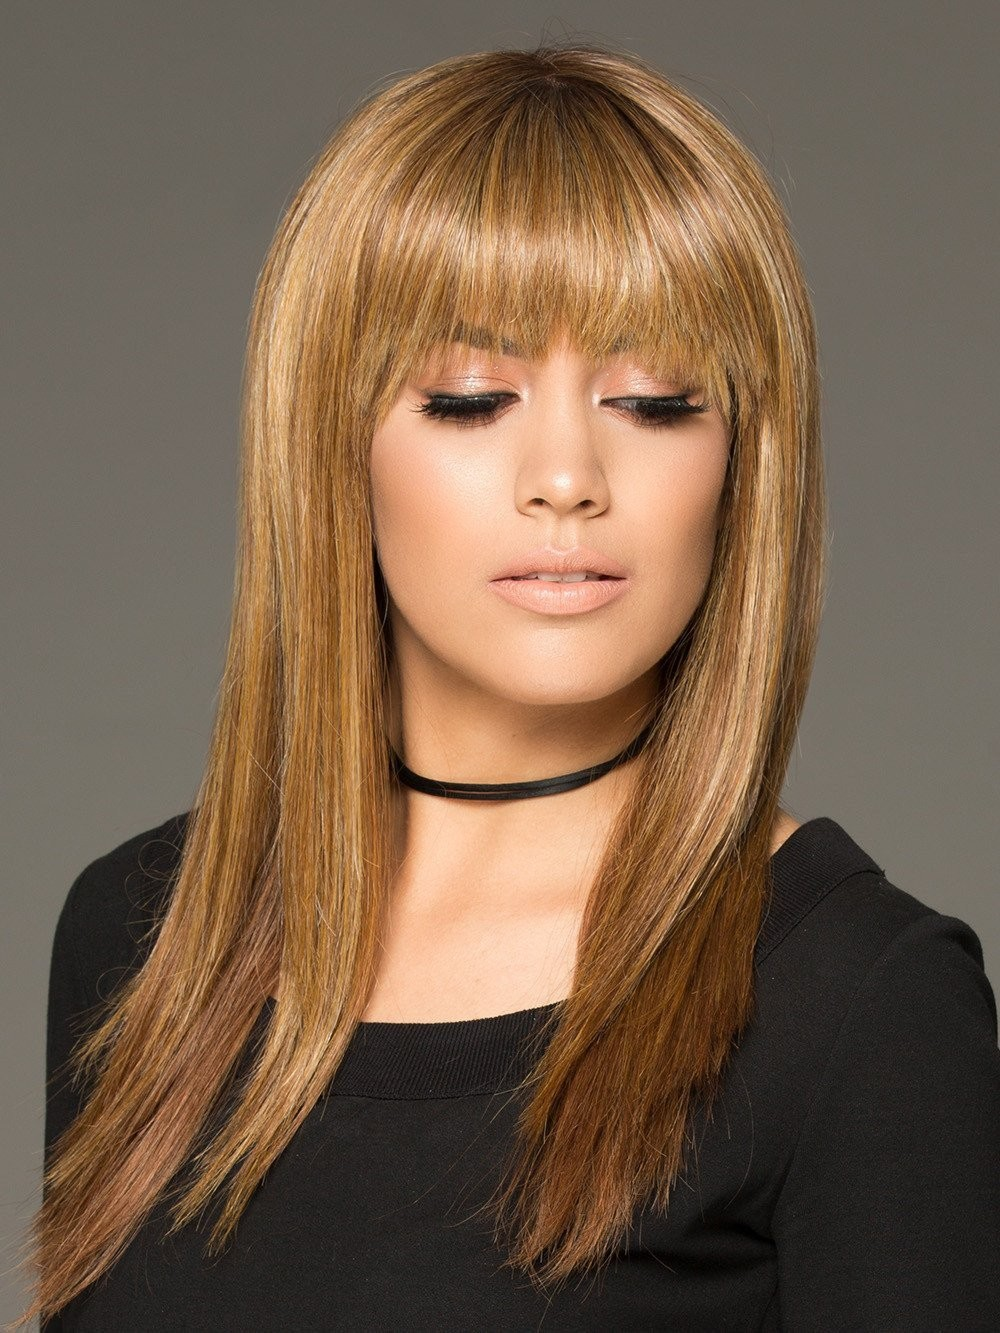 Blonde Long Sleek Women Straight Wigs with Full Bangs